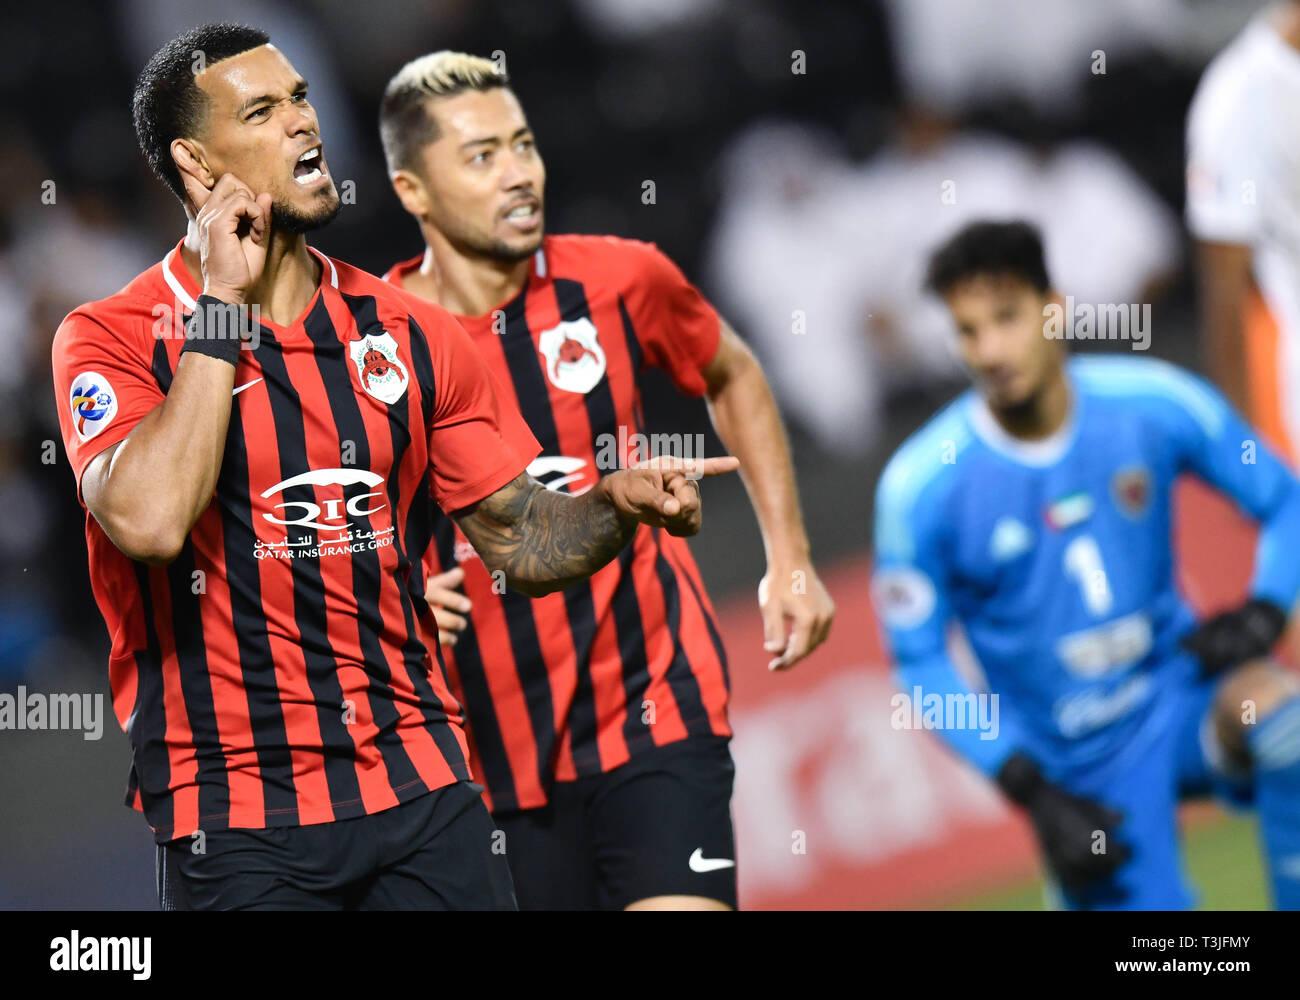 Doha, Qatar. 9th Apr, 2019. Gelmin Rivas (L) of Al Rayyan SC celebrates during the AFC Asian Champions League group B match between Qatar's Al Rayyan SC and UAE's Al Wahda FSCC at Jassim Bin Hamad Stadium in Doha, capital of Qatar, April 9, 2019. Al Wahda won 2-1. Credit: Nikku/Xinhua/Alamy Live News Stock Photo